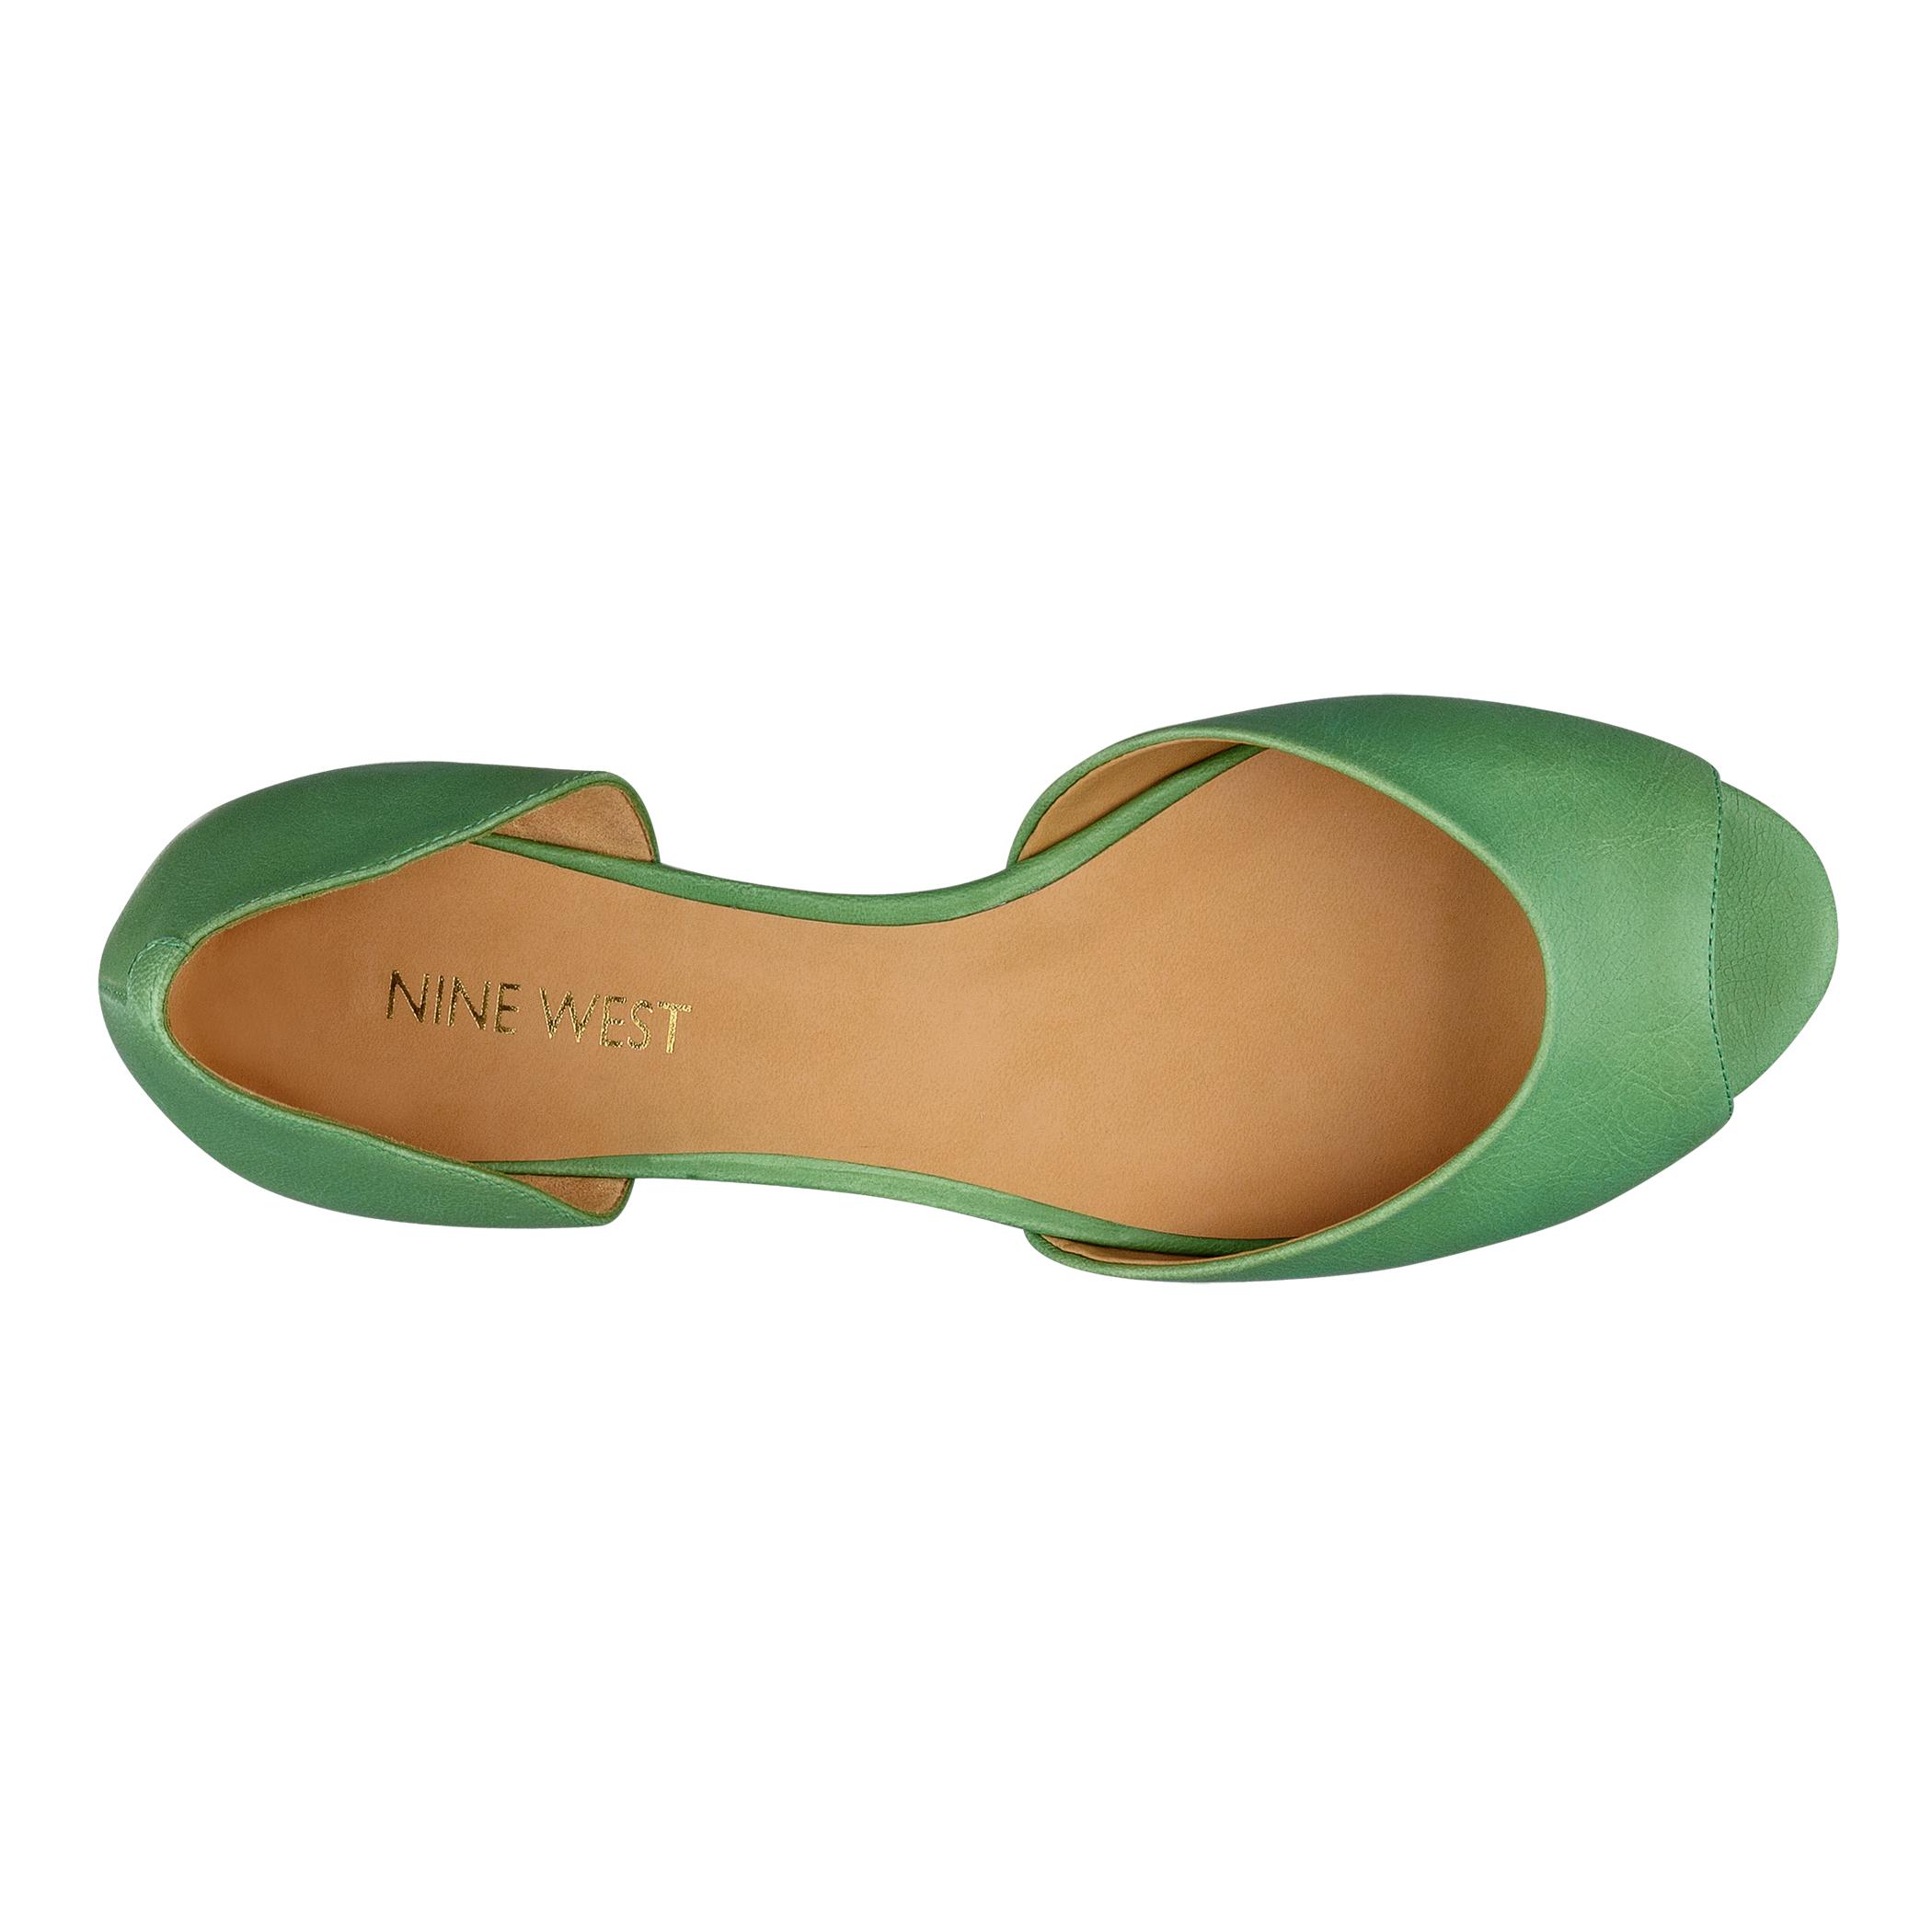 Nine West Peep Toe Flat Shoes